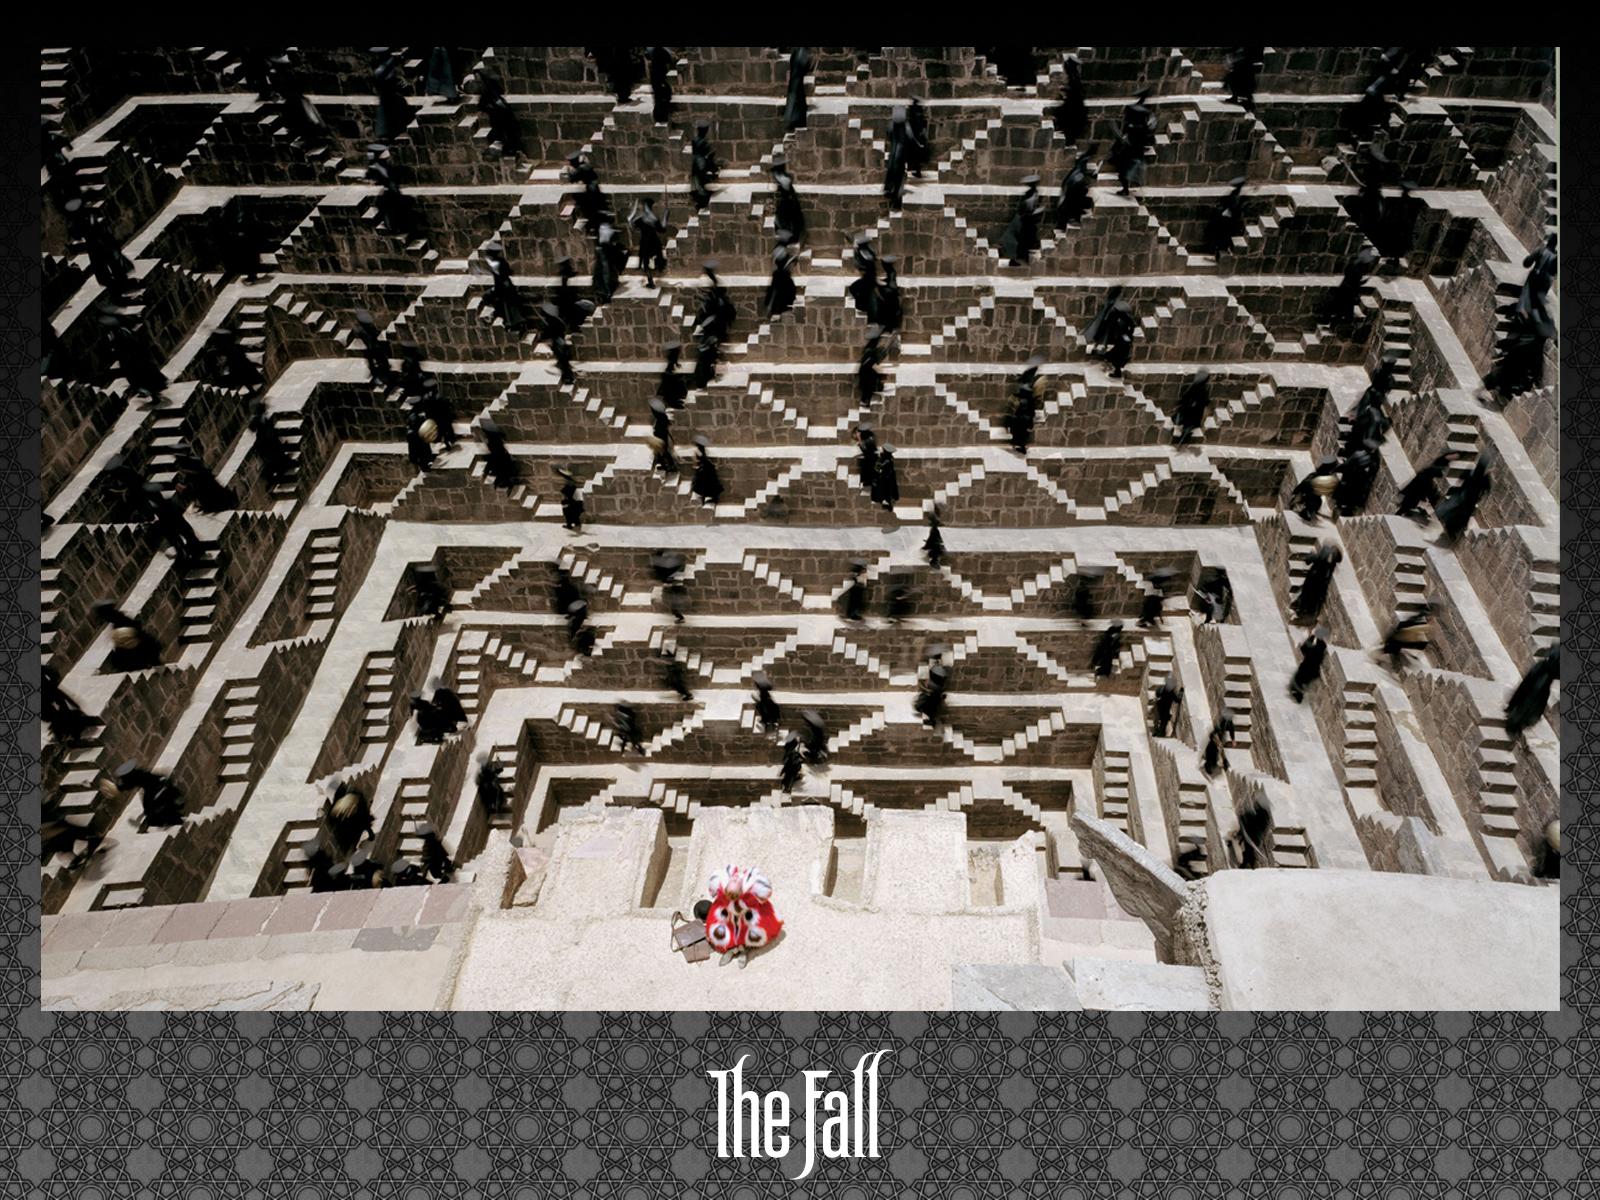 the_fall_12.jpg